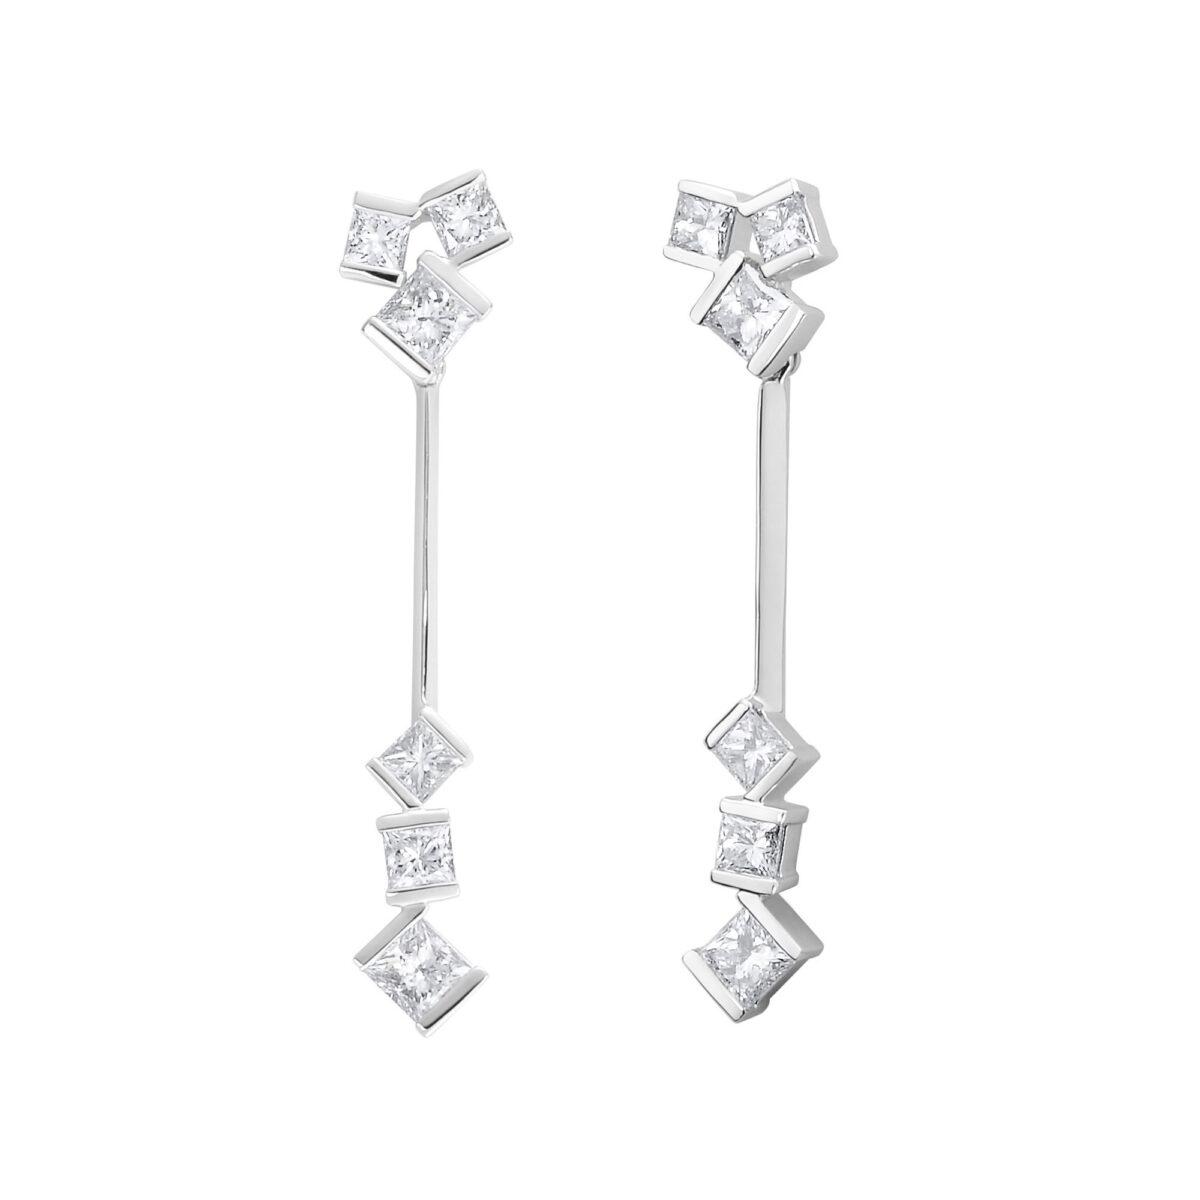 product/h/o/hopscotch-drop-earrings-1.jpg;;product/d/m/dmr-packaging_94.jpg